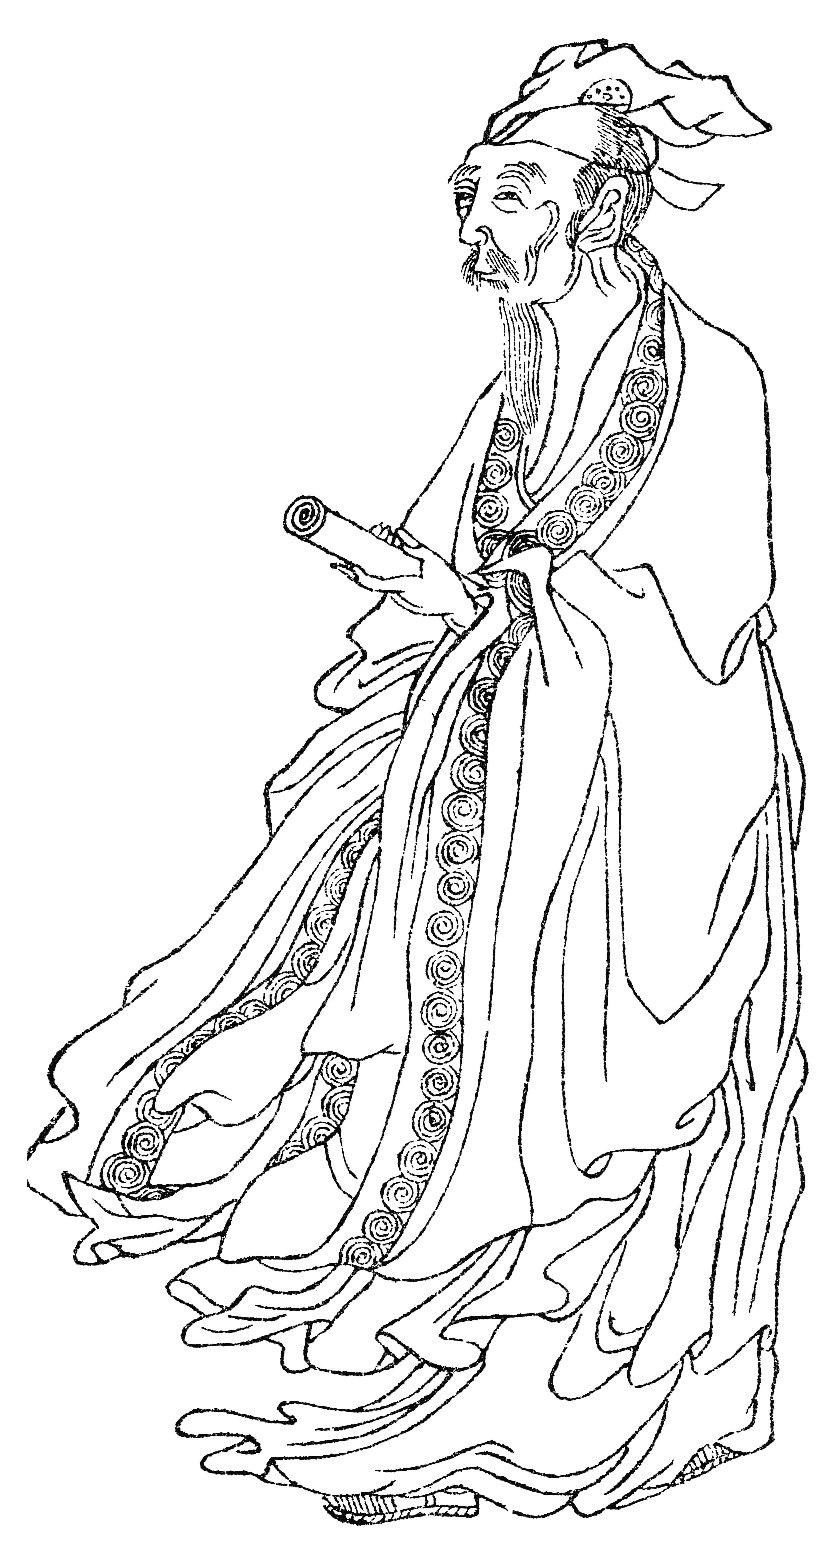 Bai Juyi chinese